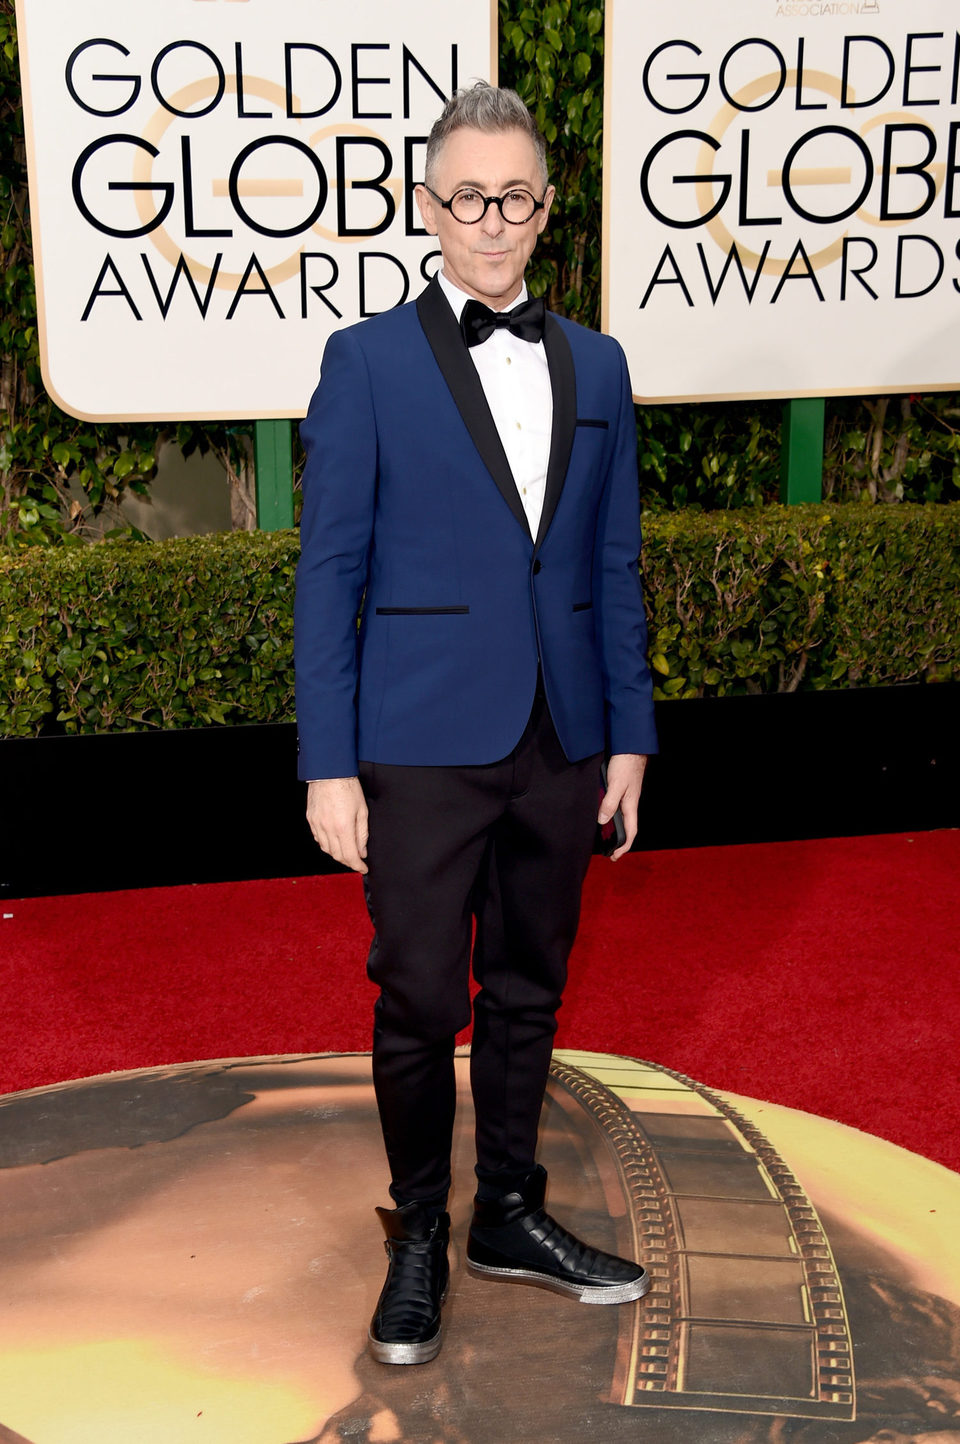 Alan Cumming in the 2016 Golden Globes red carpet